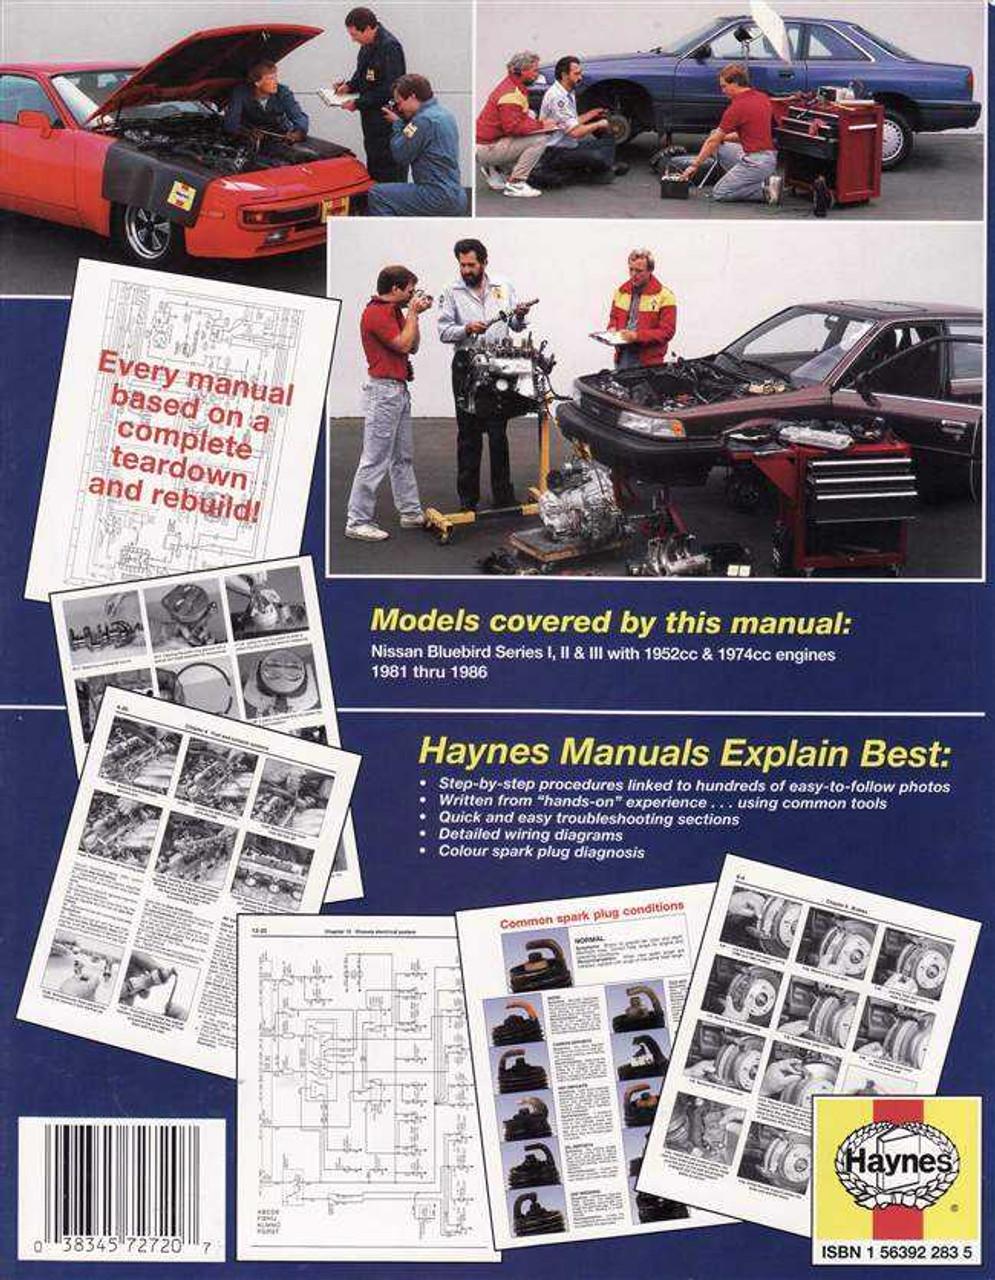 nissan bluebird series 1 2 amp 3 1981 1986 workshop manual  [ 995 x 1280 Pixel ]